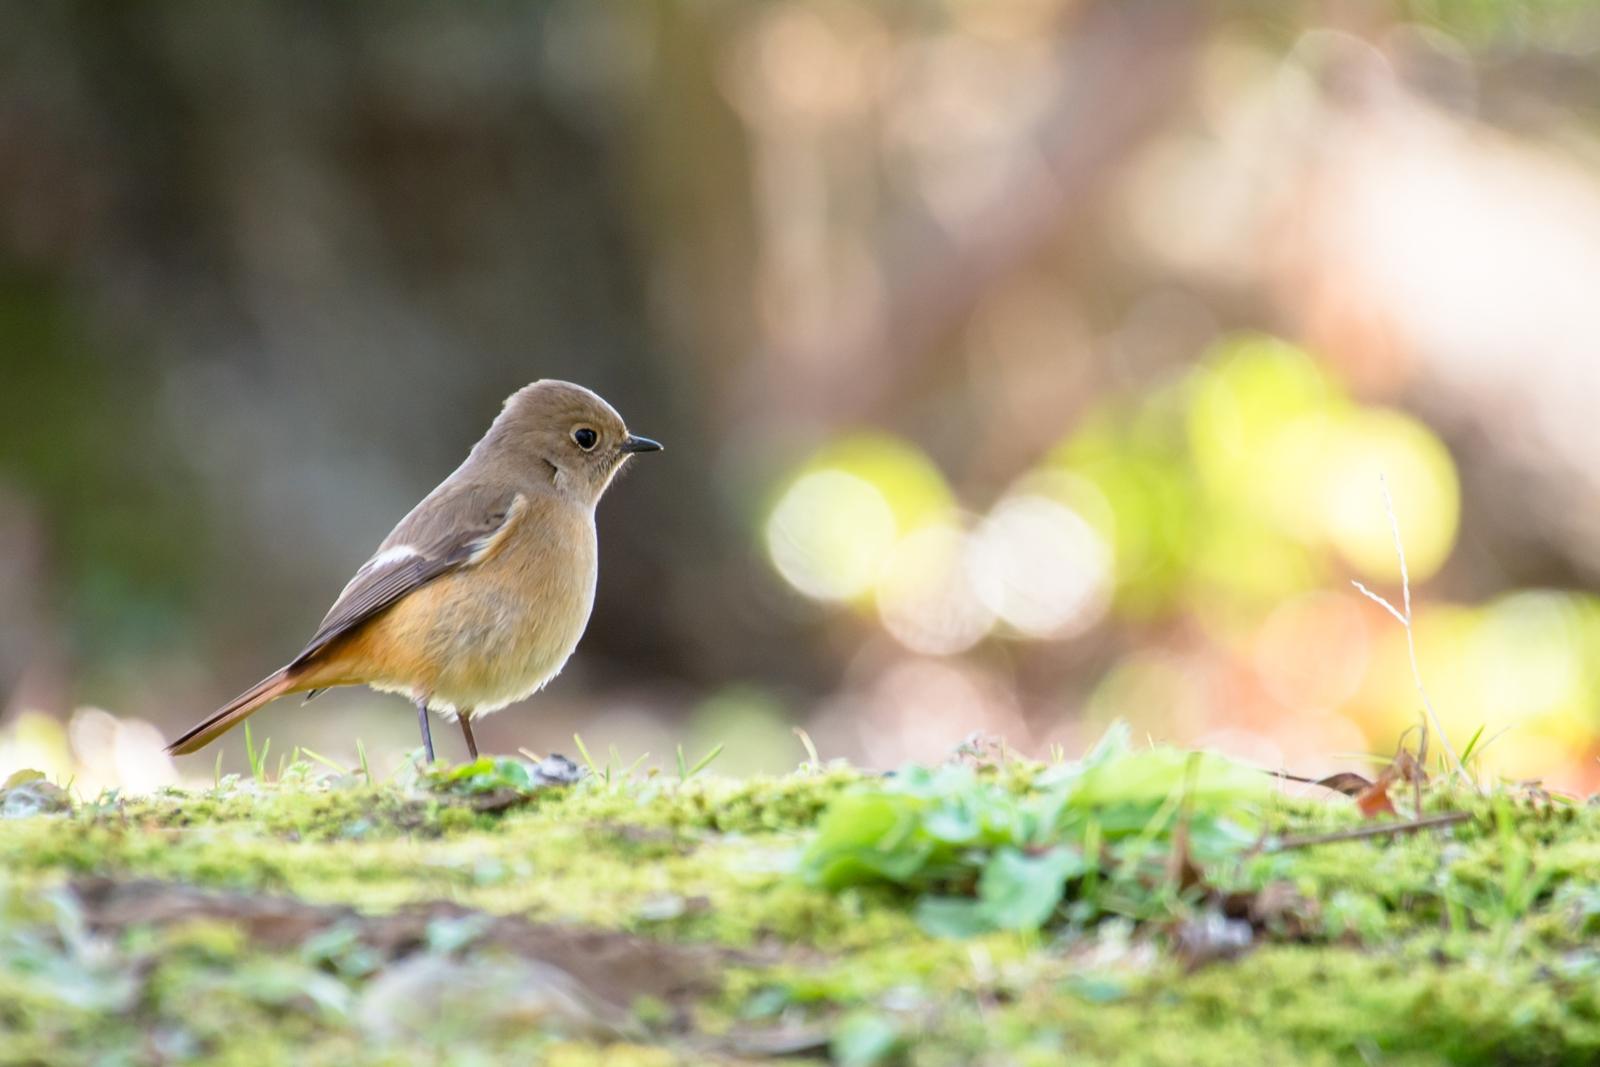 Photo: 息づく春の大地 Spring earth to breathe.  聞こえてくる 春の足音 少しずつ少しずつ 草木たちが息づいていく  Photo of Daurian Redstart. (ジョウビタキ)  #cooljapan #365cooljapanmay  #birdphotography #birds  #sigma #kawaii  #日本の写真文化を海外へ  Nikon D7100 SIGMA APO 50-500mm F5-6.3 DG OS HSM [ Day291, February 27th ]  小鳥の詩朗読 http://youtu.be/slrfZo4mzQI?list=PL2YtHGm0-R3qVsaqvQe9OYdJFCkI98wzF